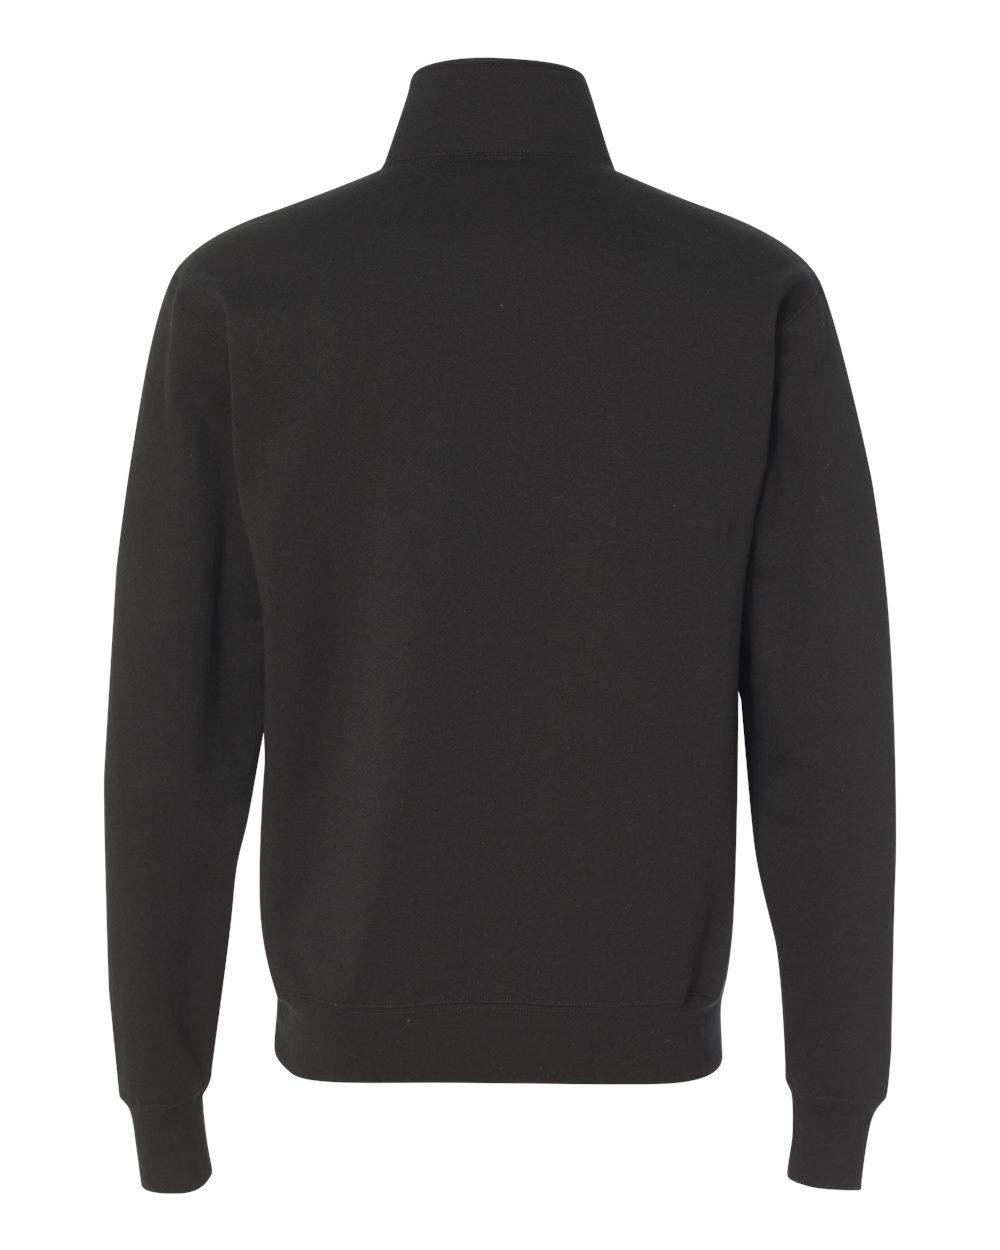 Champion-Mens-Double-Dry-Eco-Quarter-Zip-Pullover-Sweatshirt-S400-up-to-3XL miniature 7